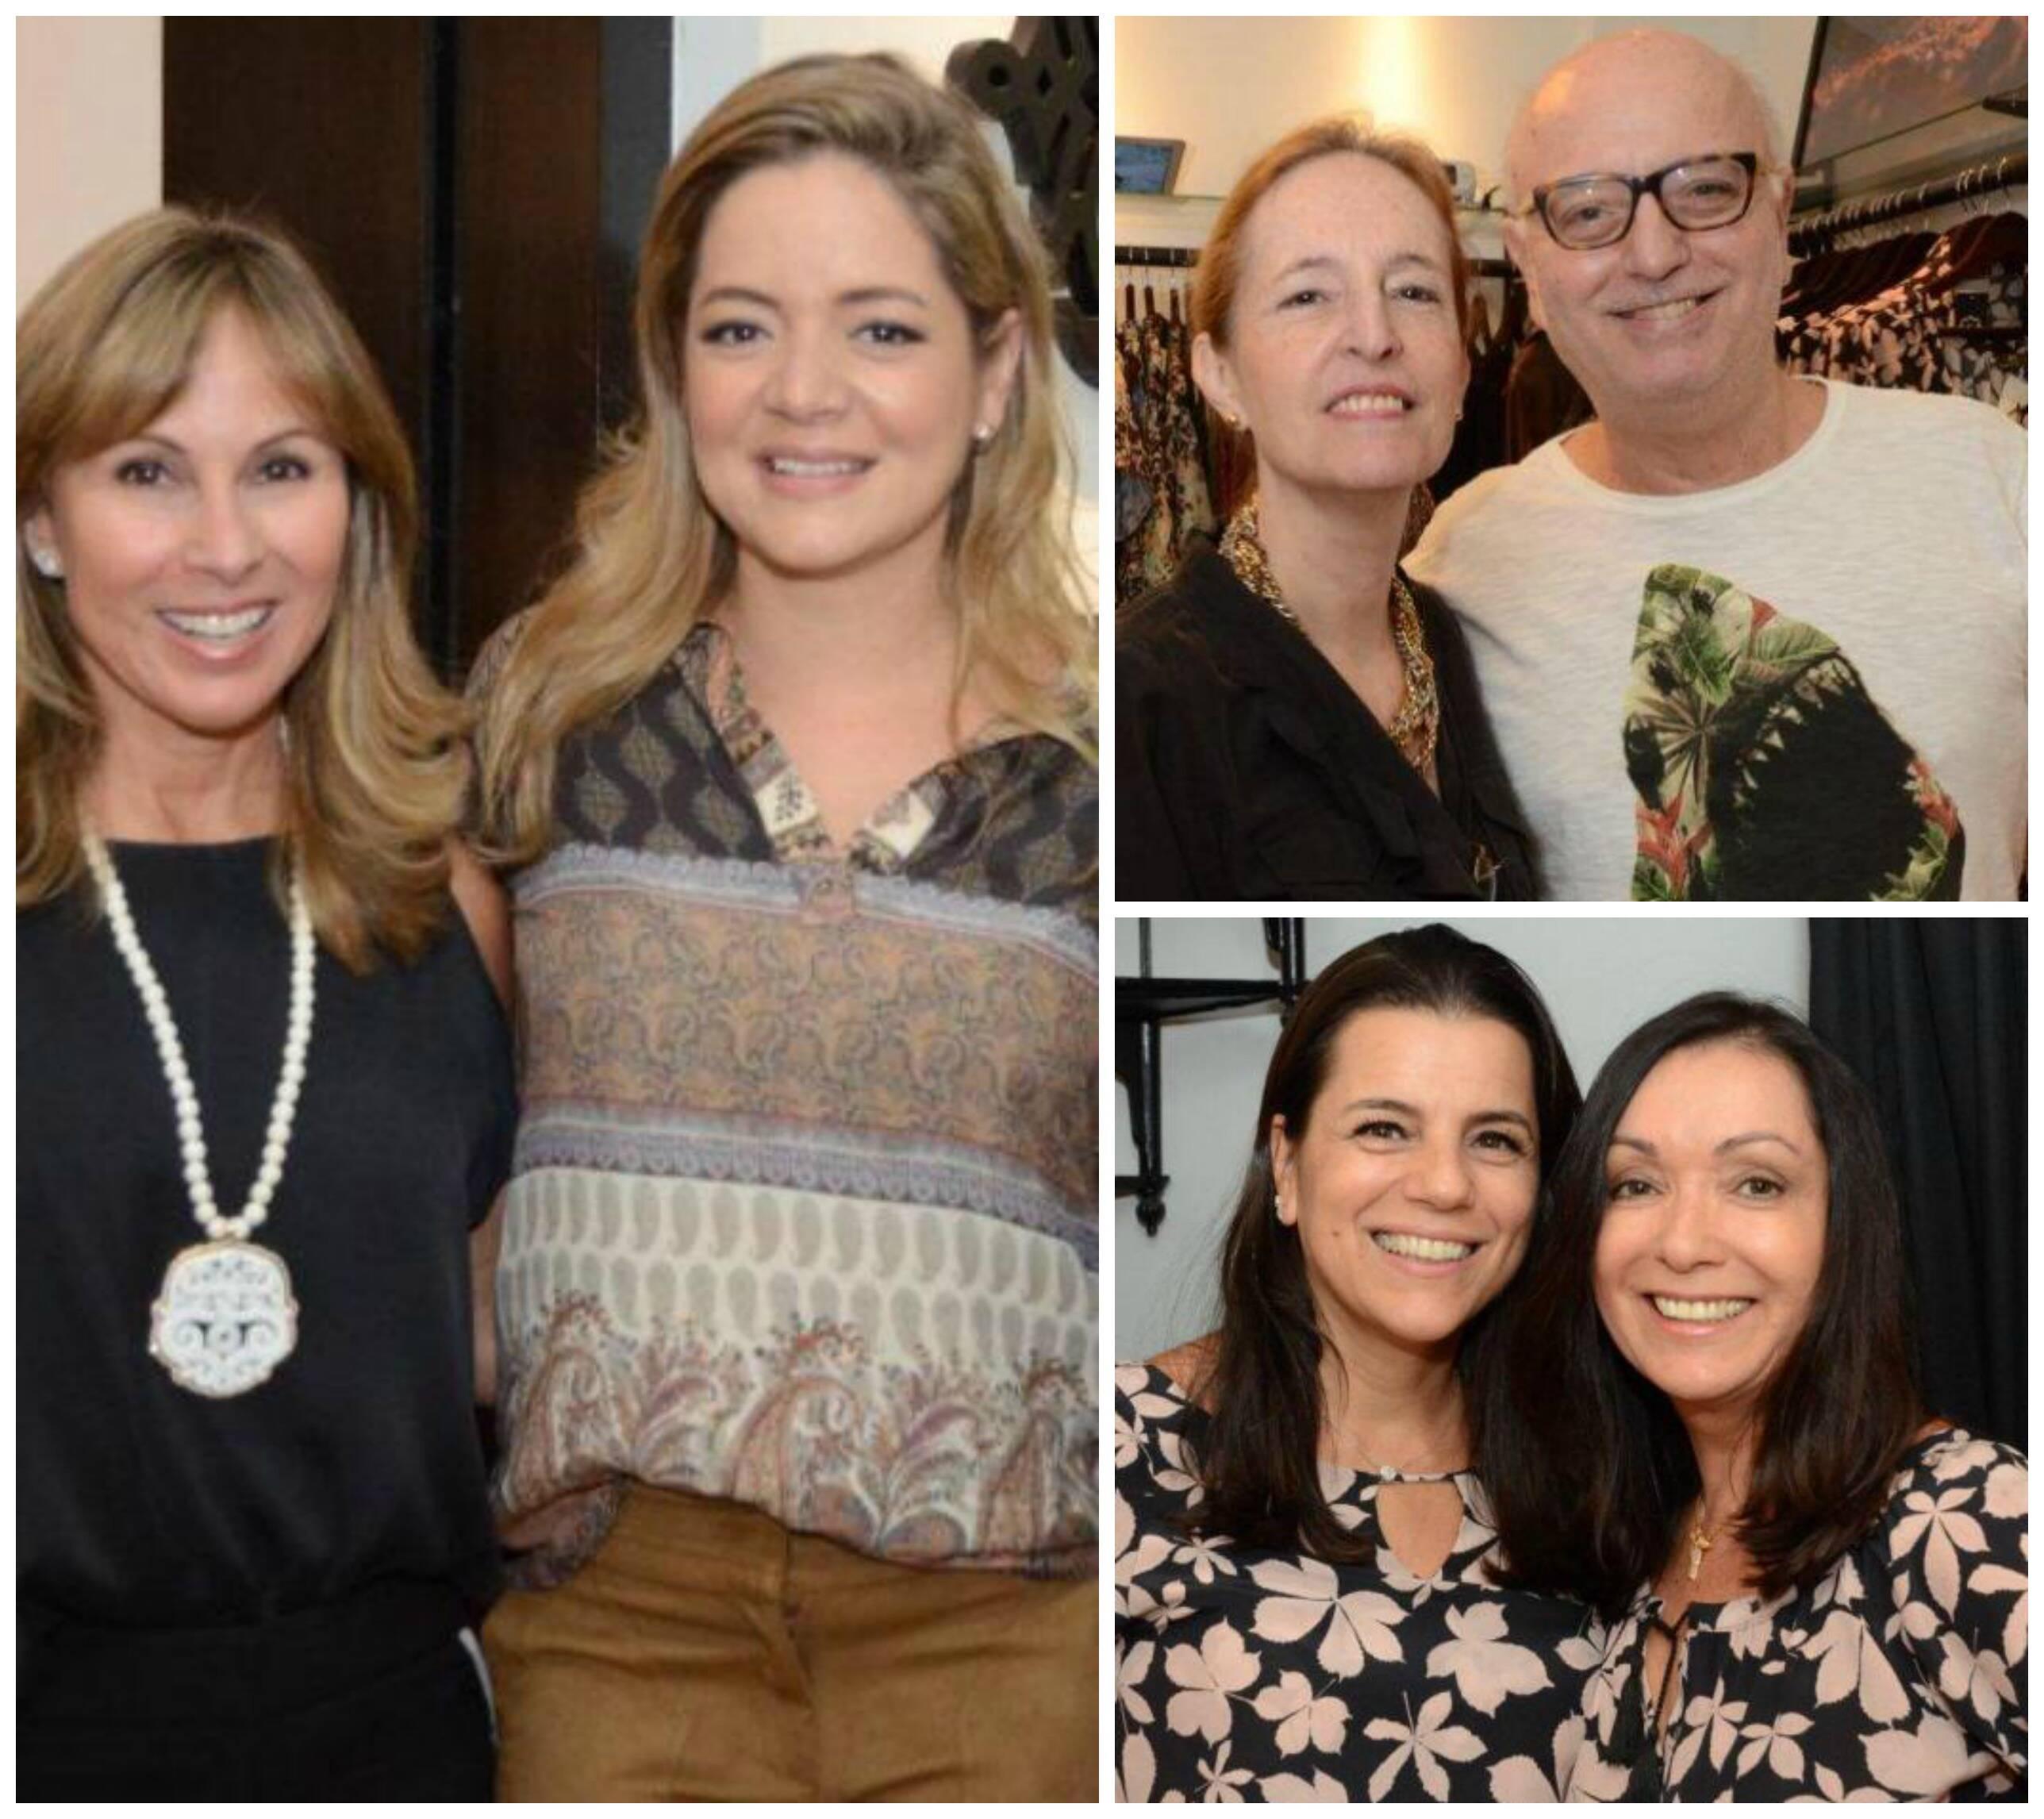 No sentido horário: Andrea Rudge e Bianca Gibbon; Aby Penteado e Alberto Sabino; Tereza Gibbon e Vera Cougo